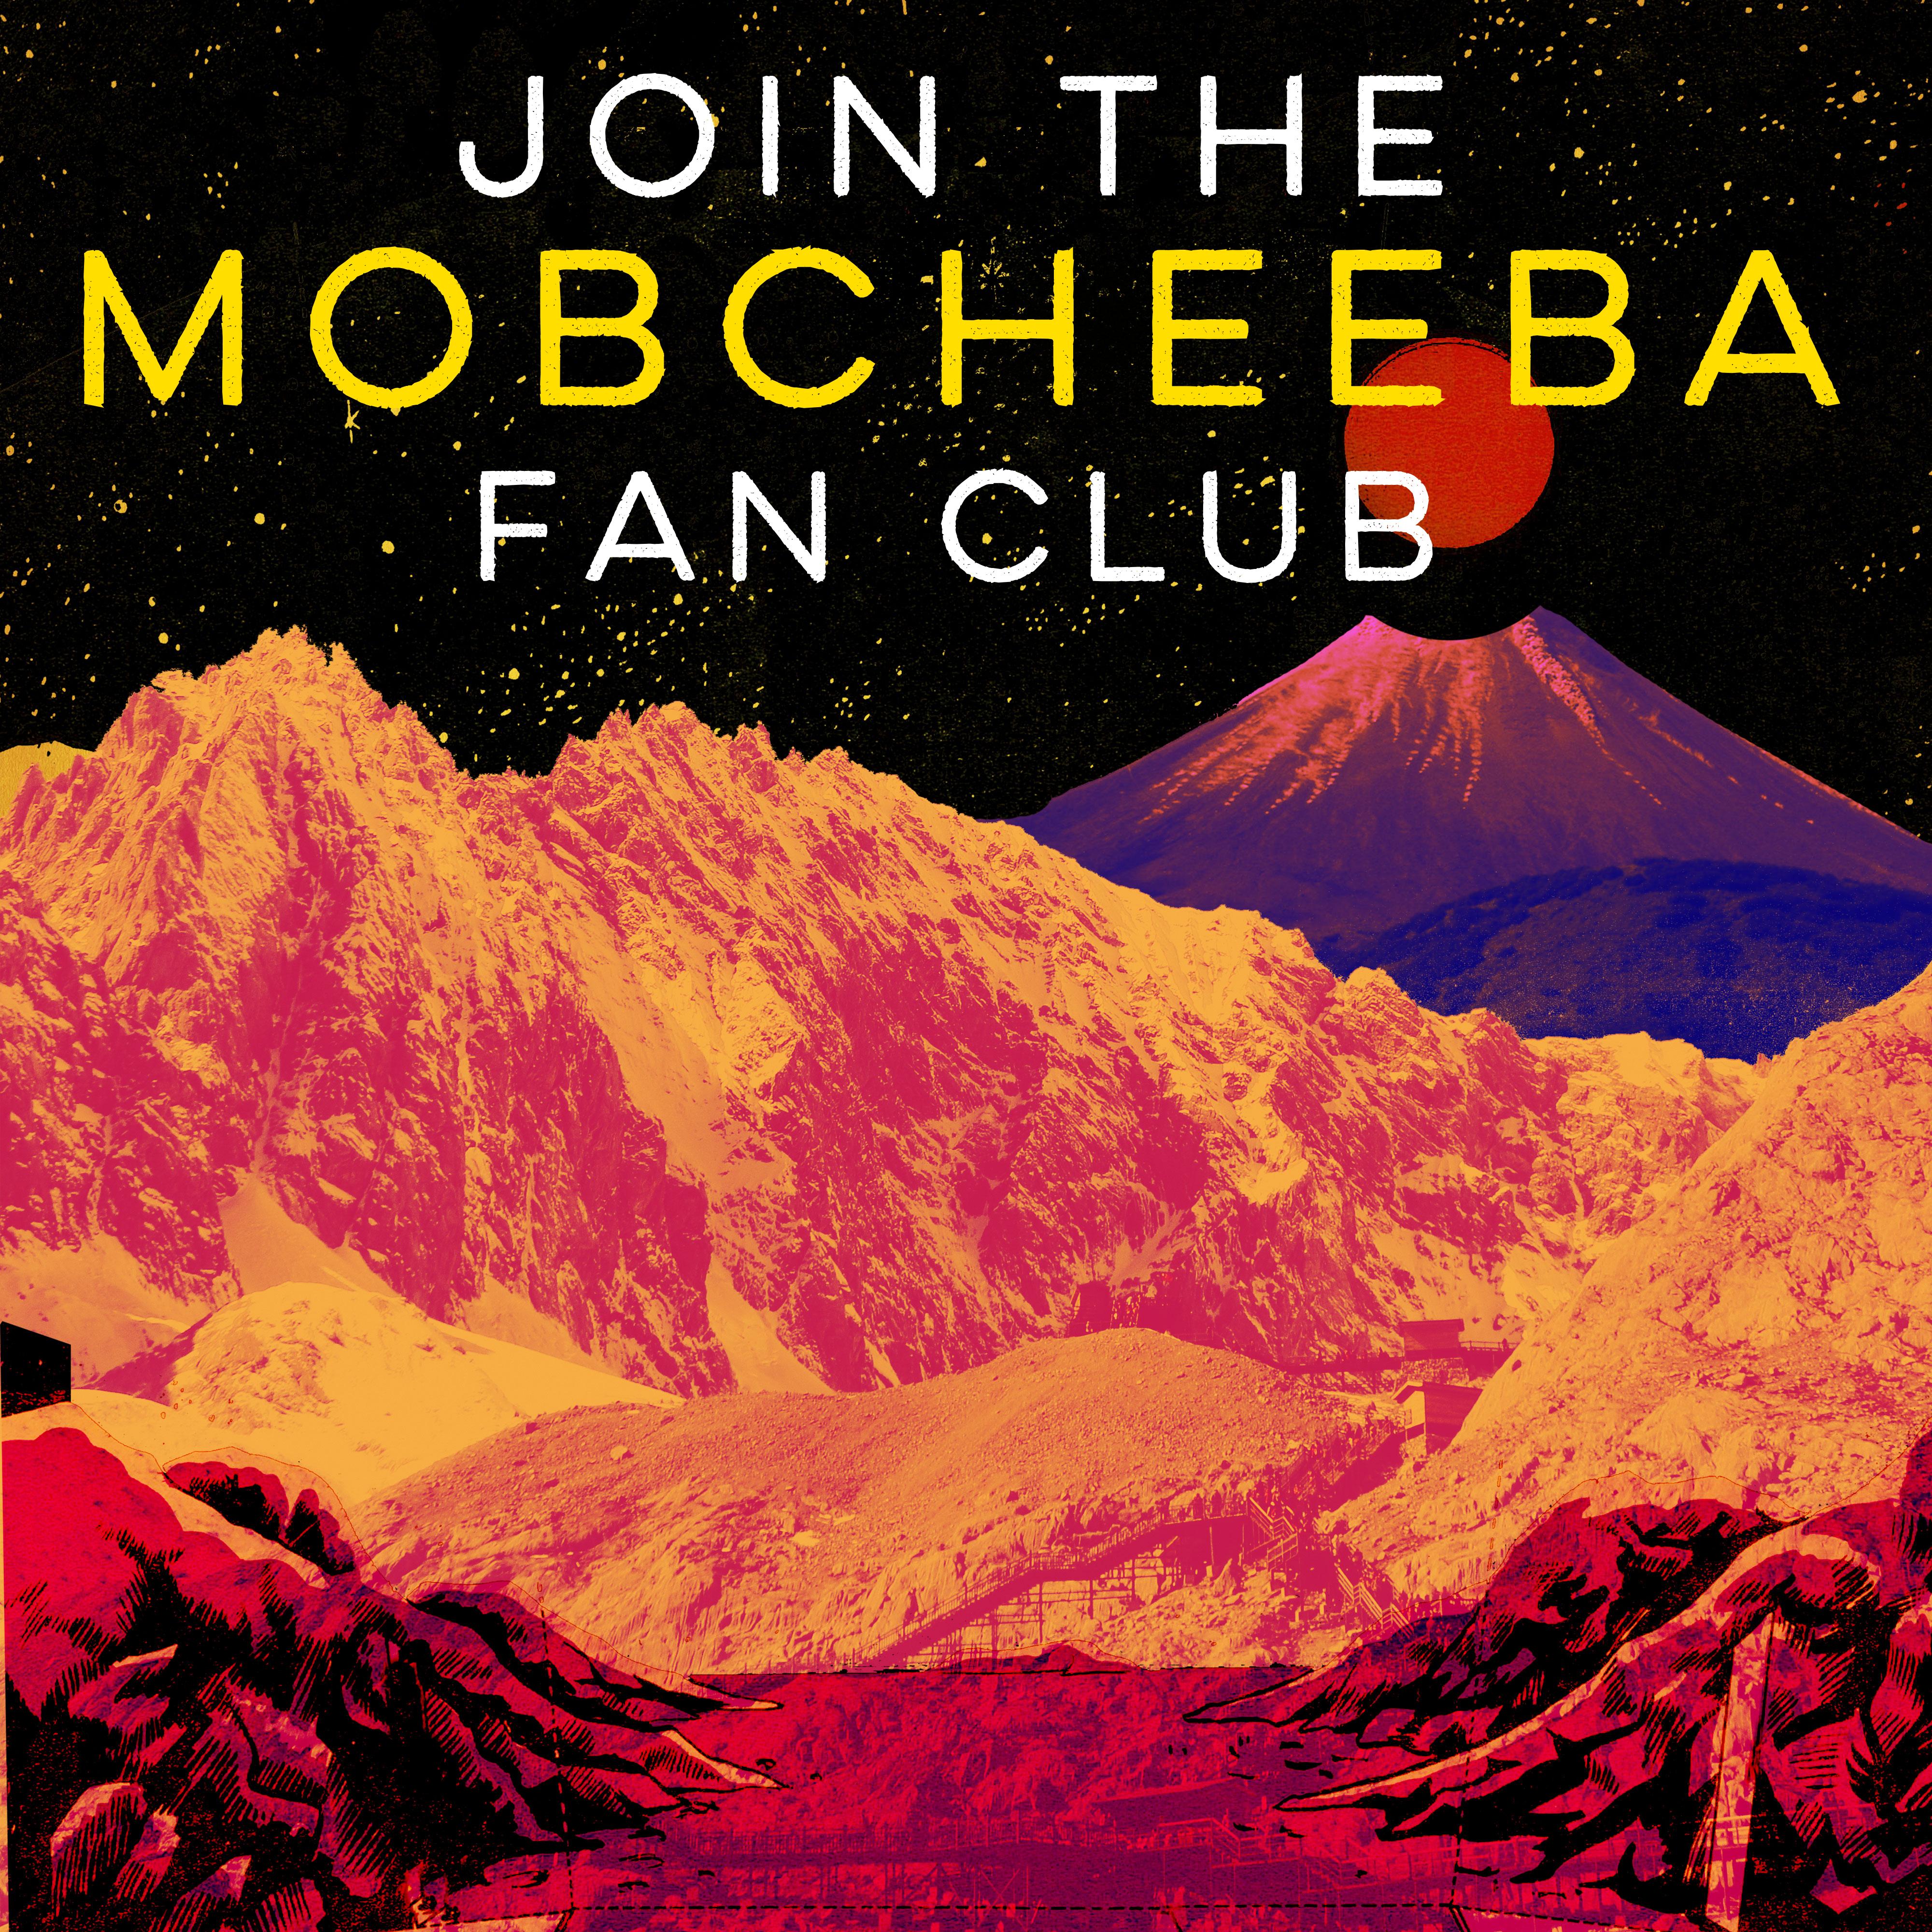 Join the MobCheeba Fan Club - Morcheeba